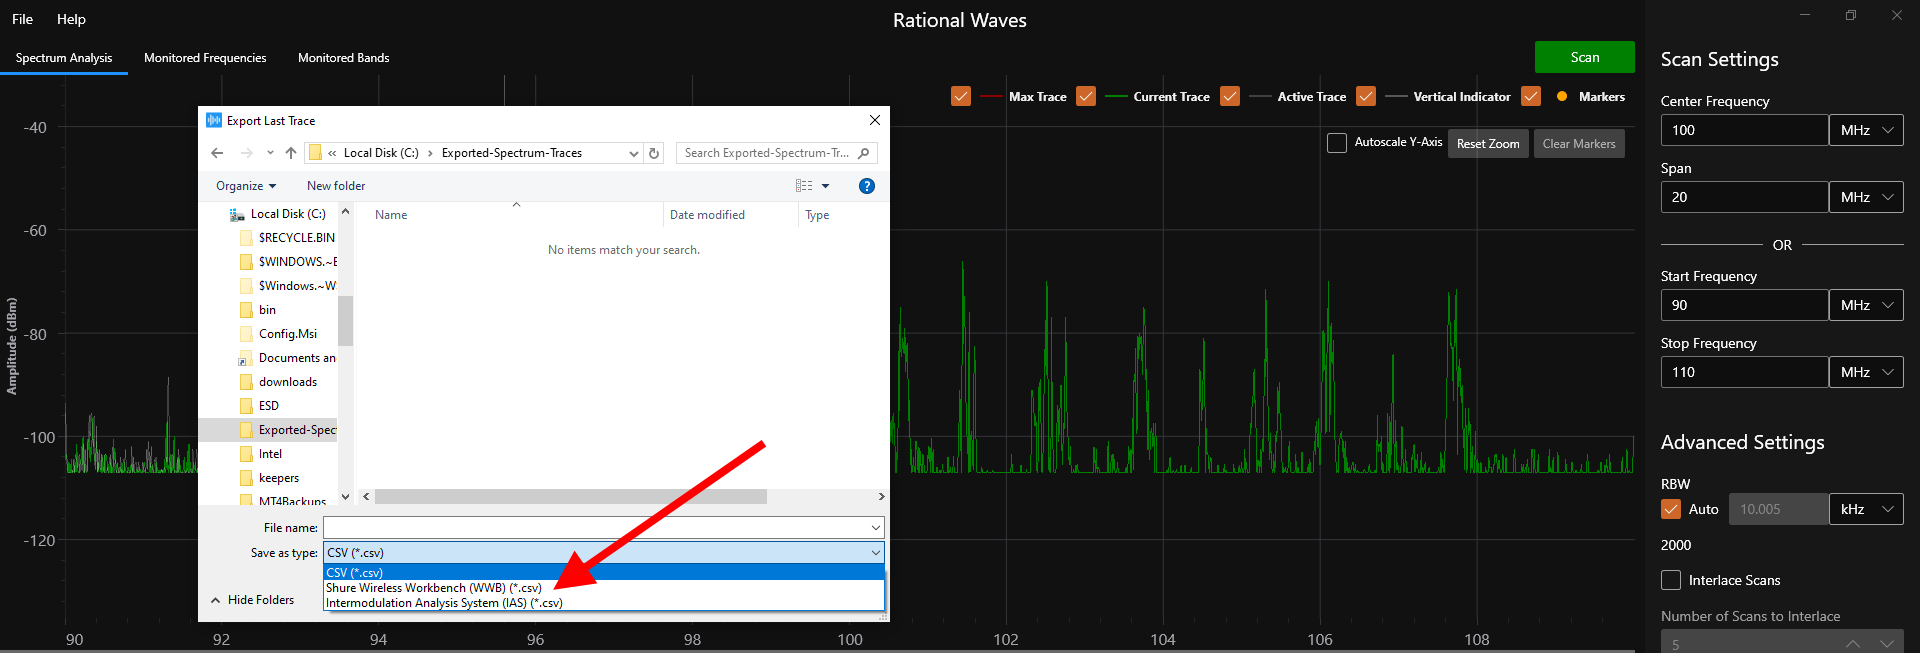 Rational Waves RF Spectrum Analysis Software